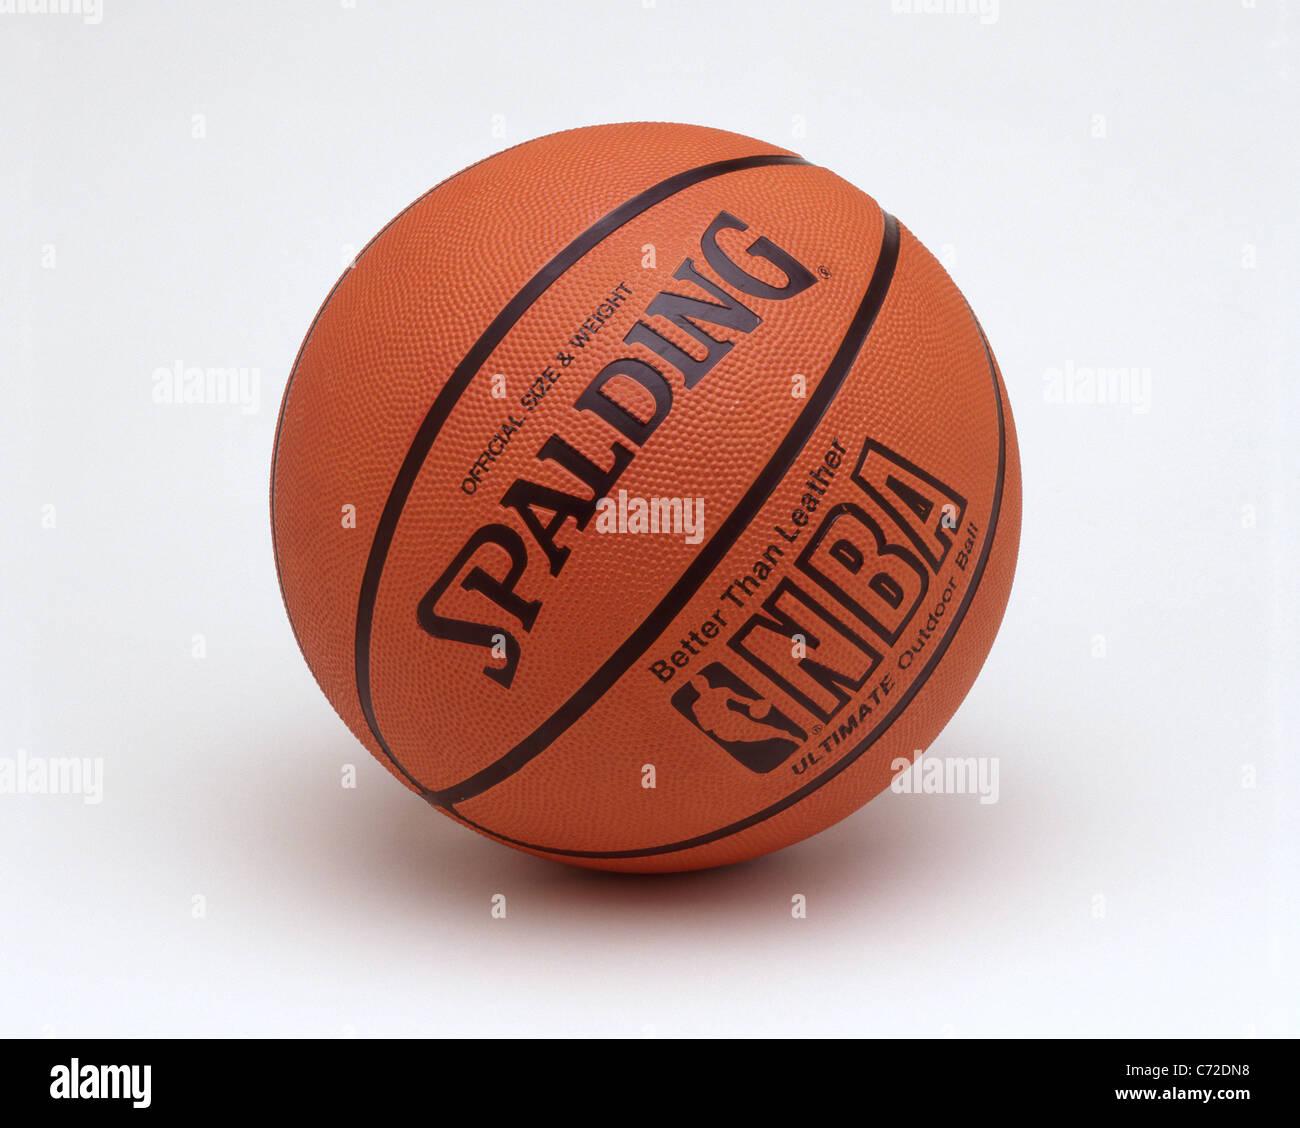 NBA Basketball, Los Angeles, California, Stati Uniti d'America Immagini Stock